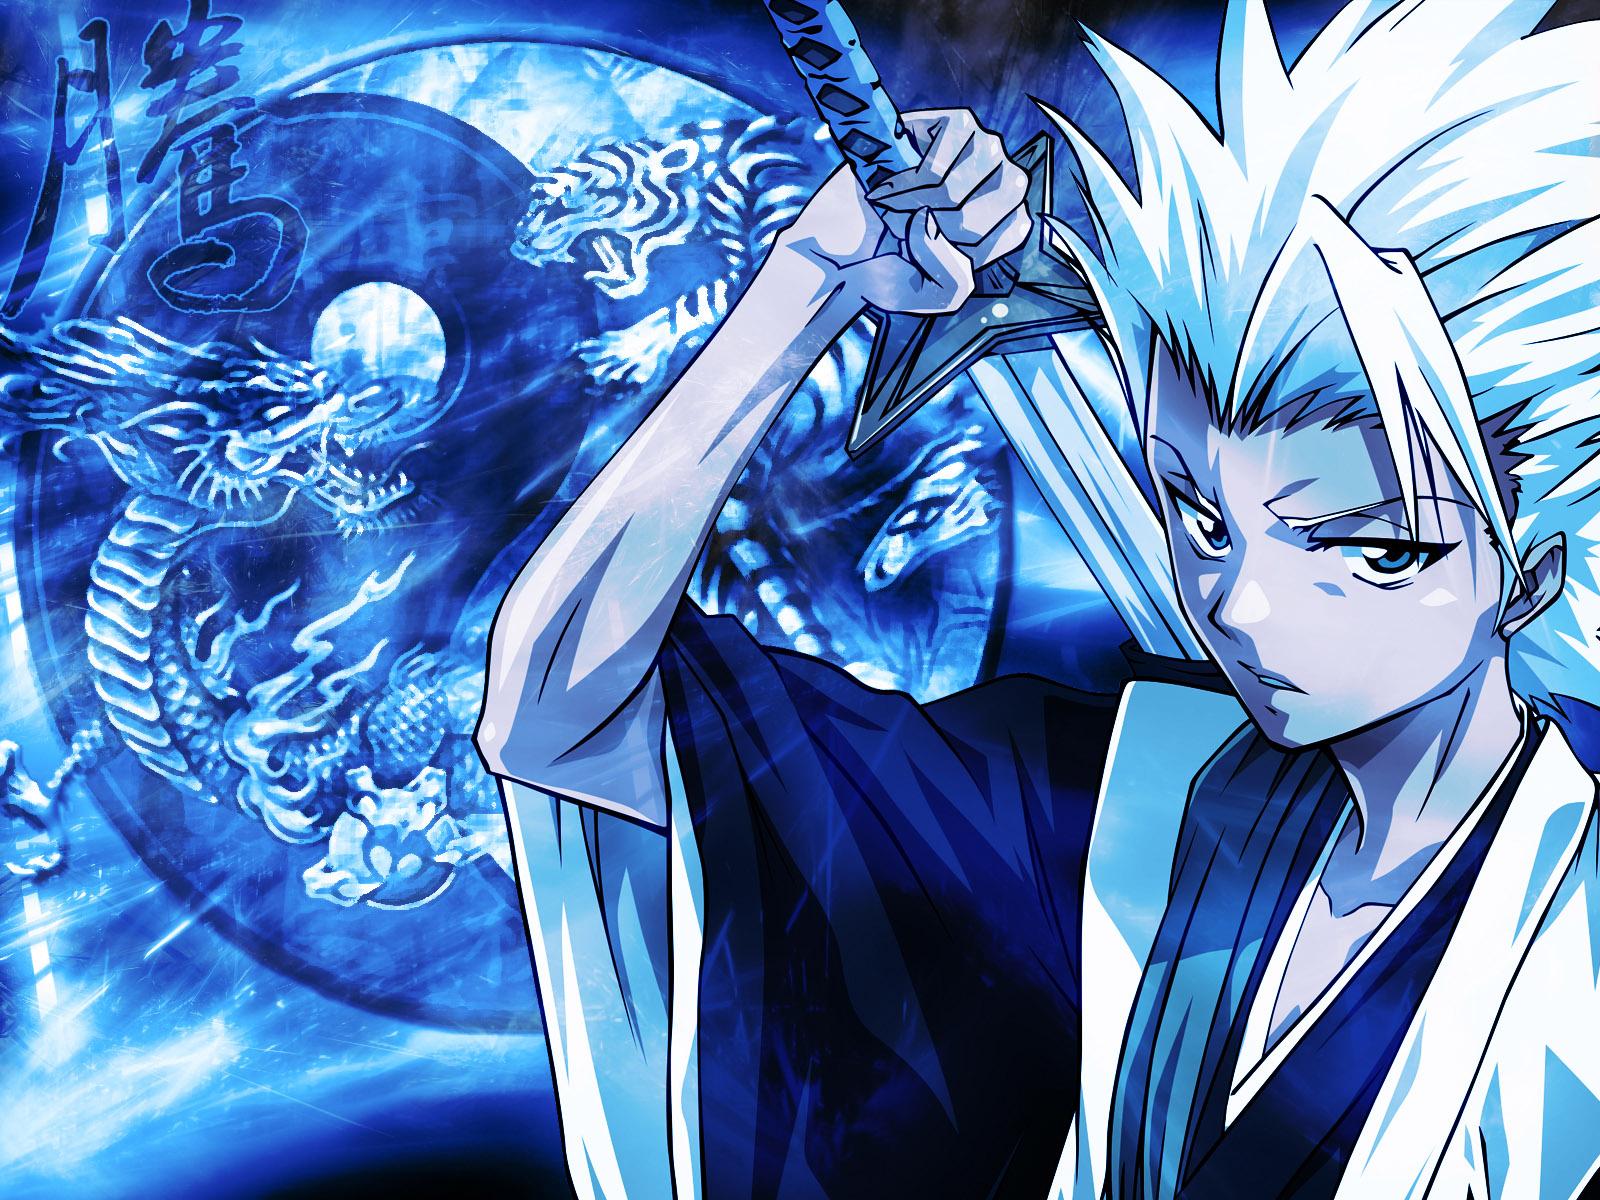 Blue Hitsugaya Toshirou Bleach Anime Wallpaper